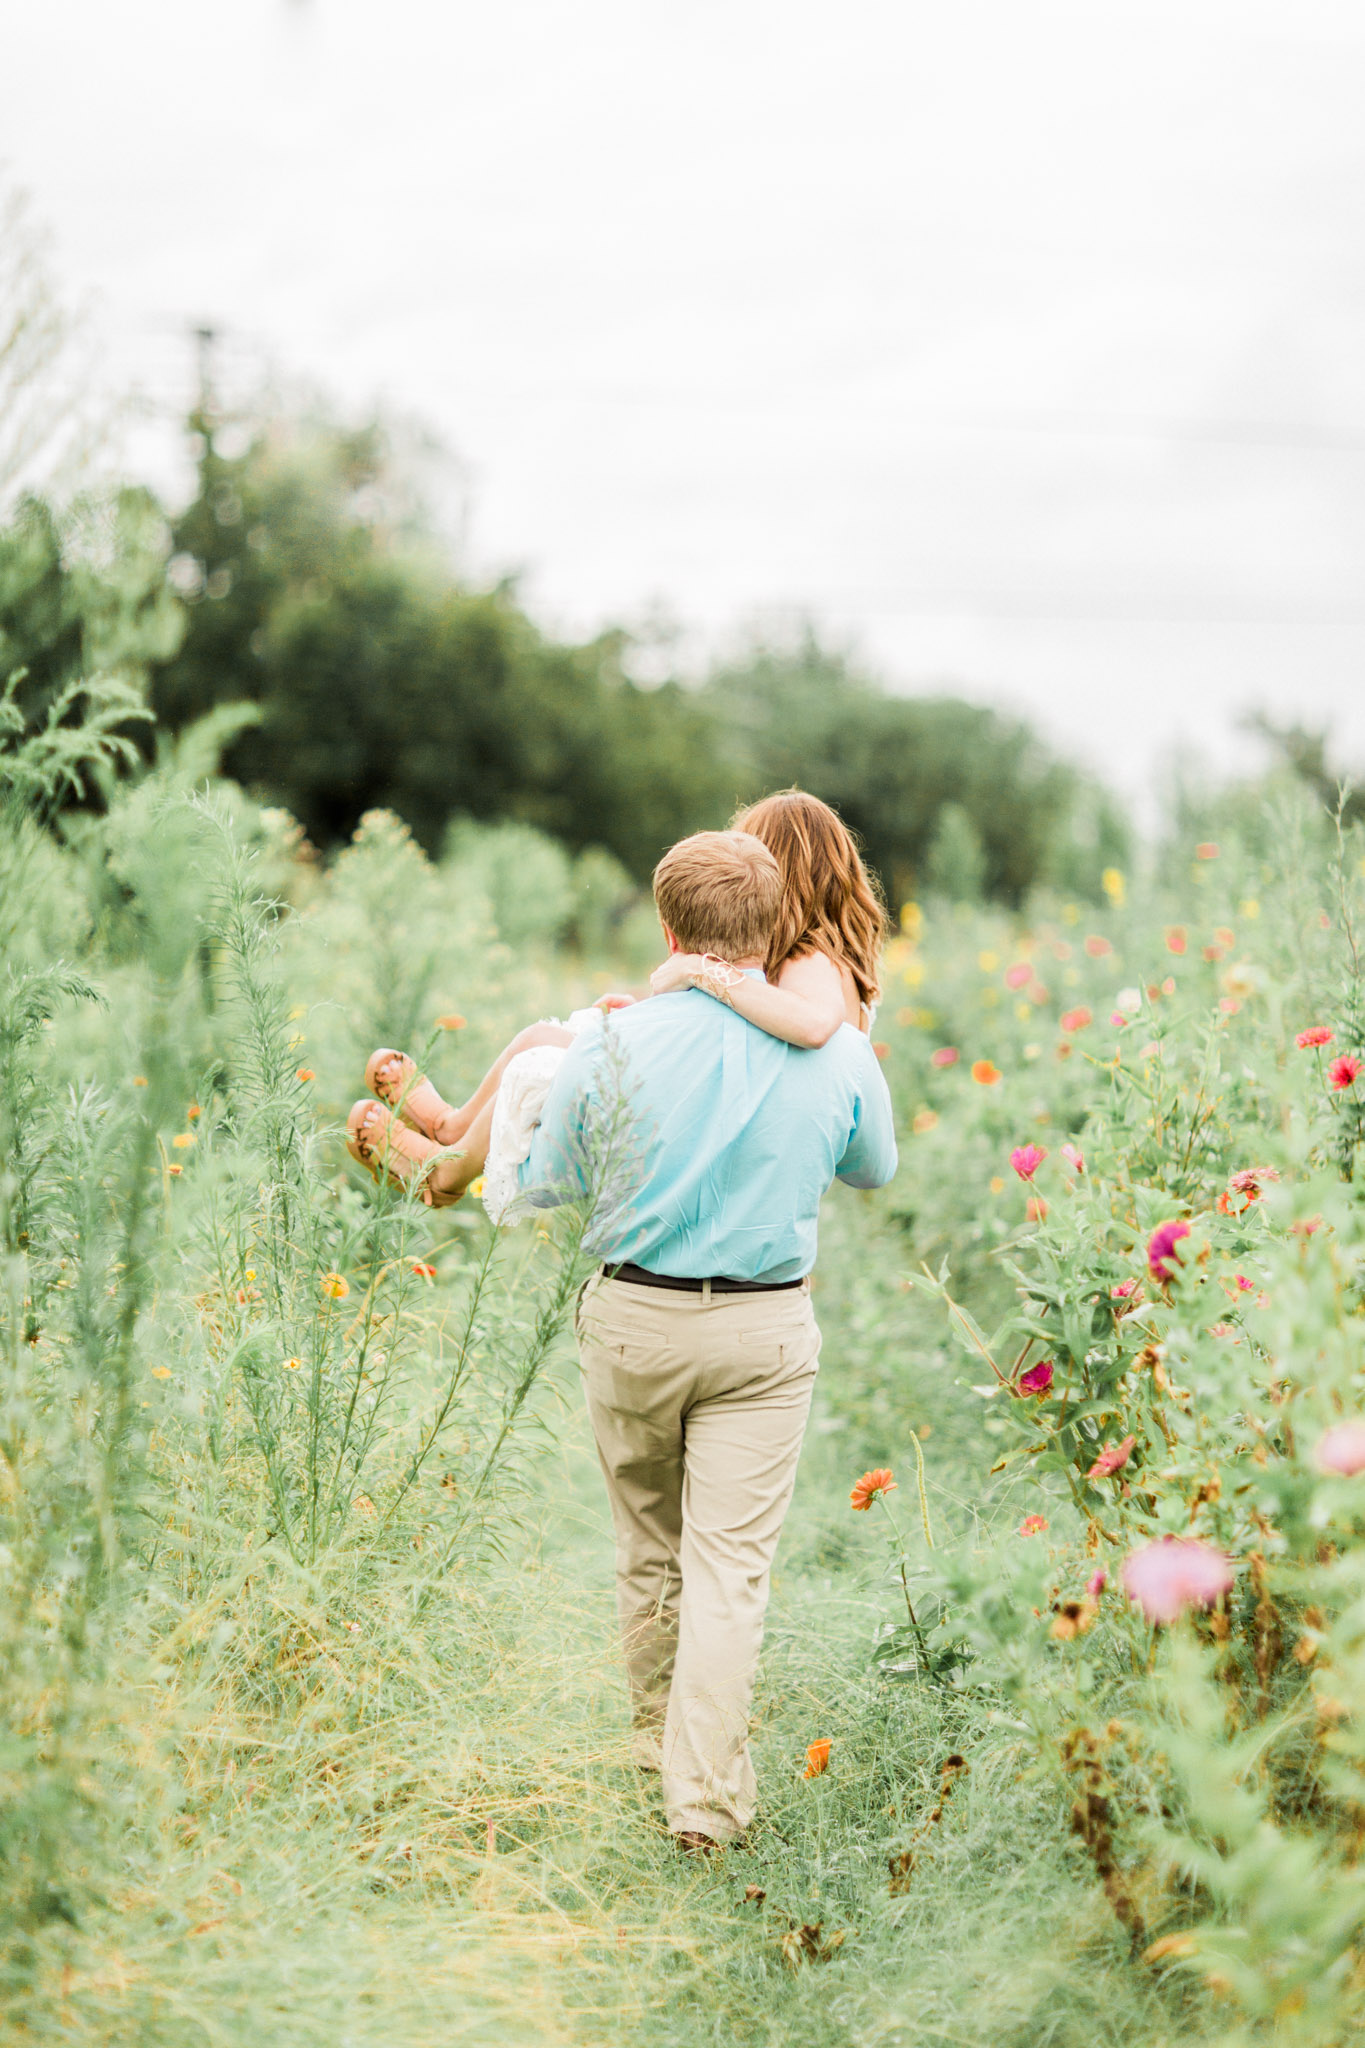 North Texas Engagement Photos - Elegant Photography